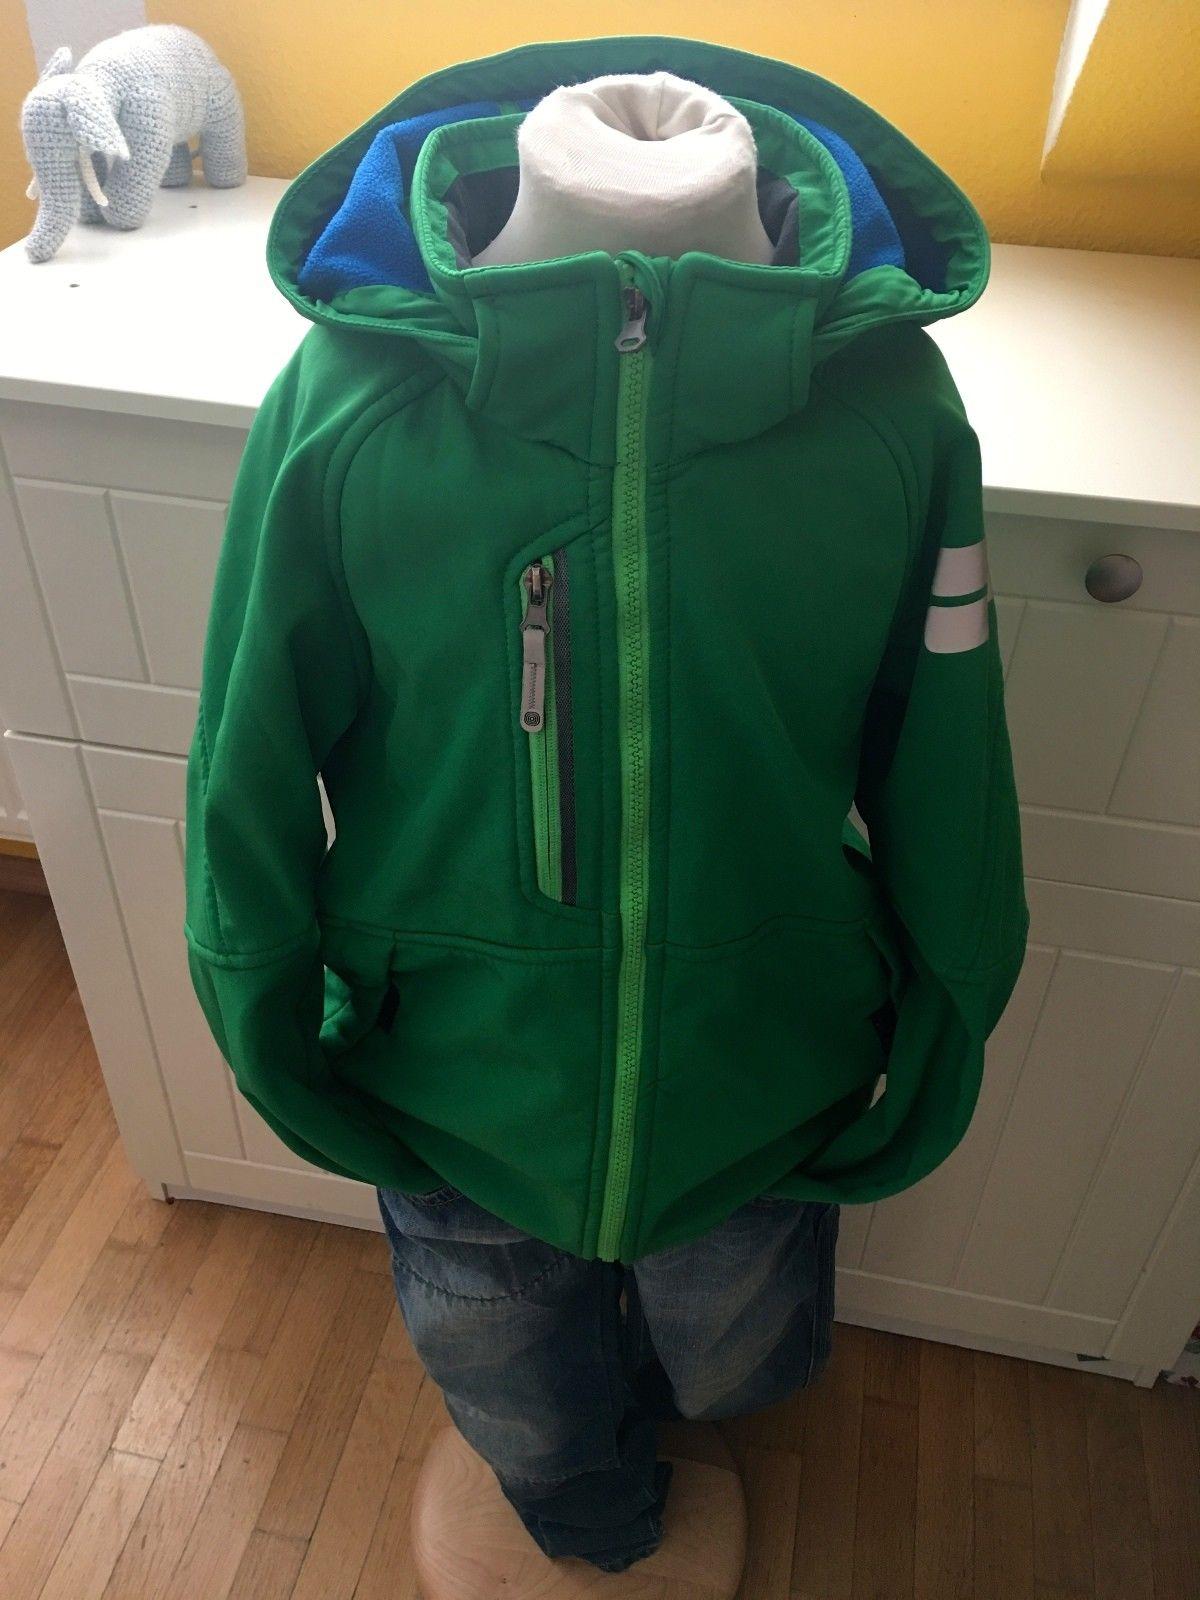 H&M Softhellsjacke Jacke grün Gr. 134 rare wneu